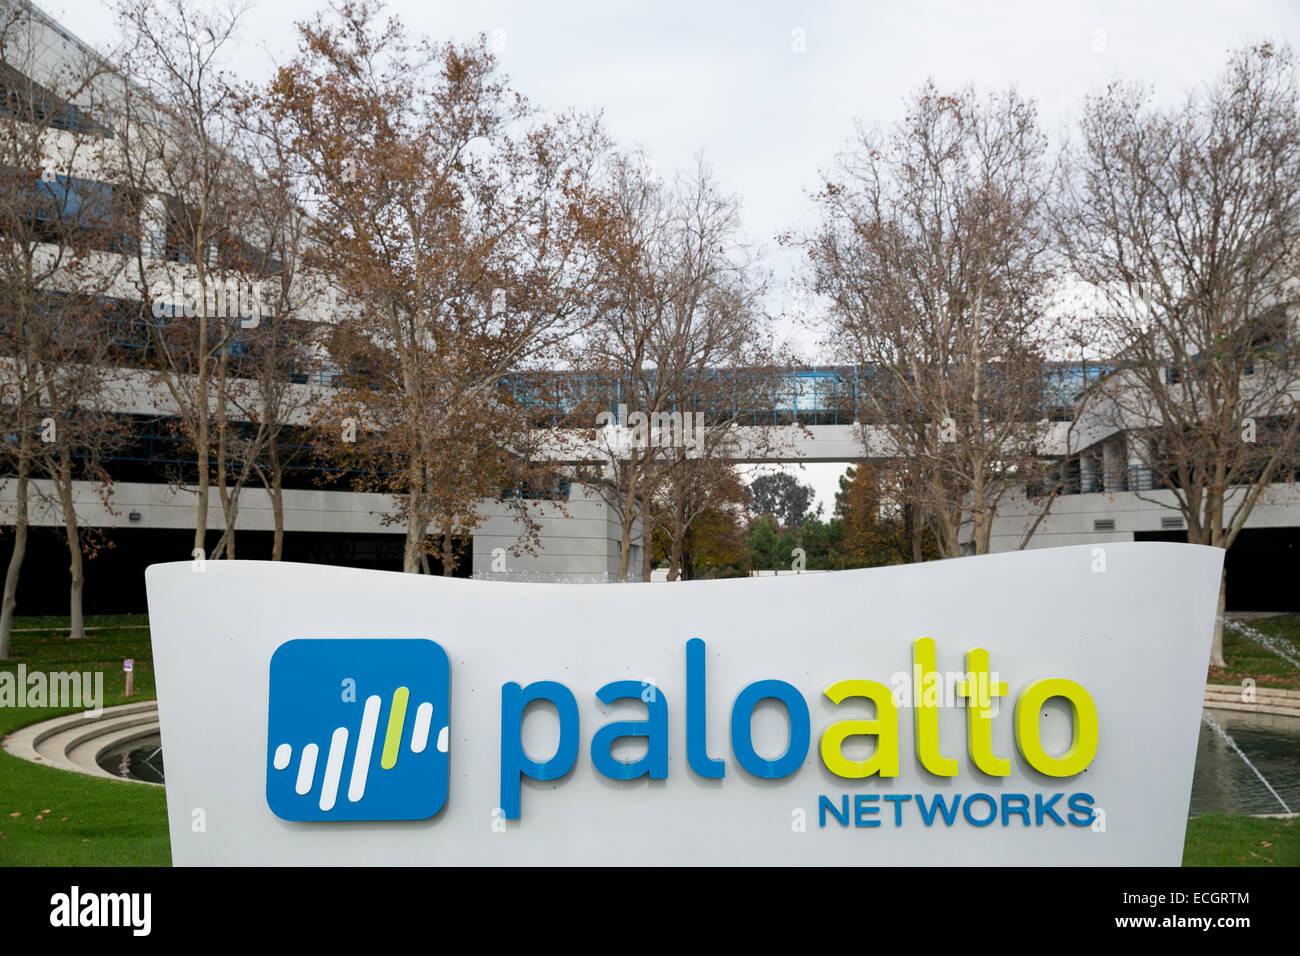 Palo Alto Stock Photos Palo Alto Stock Images Alamy